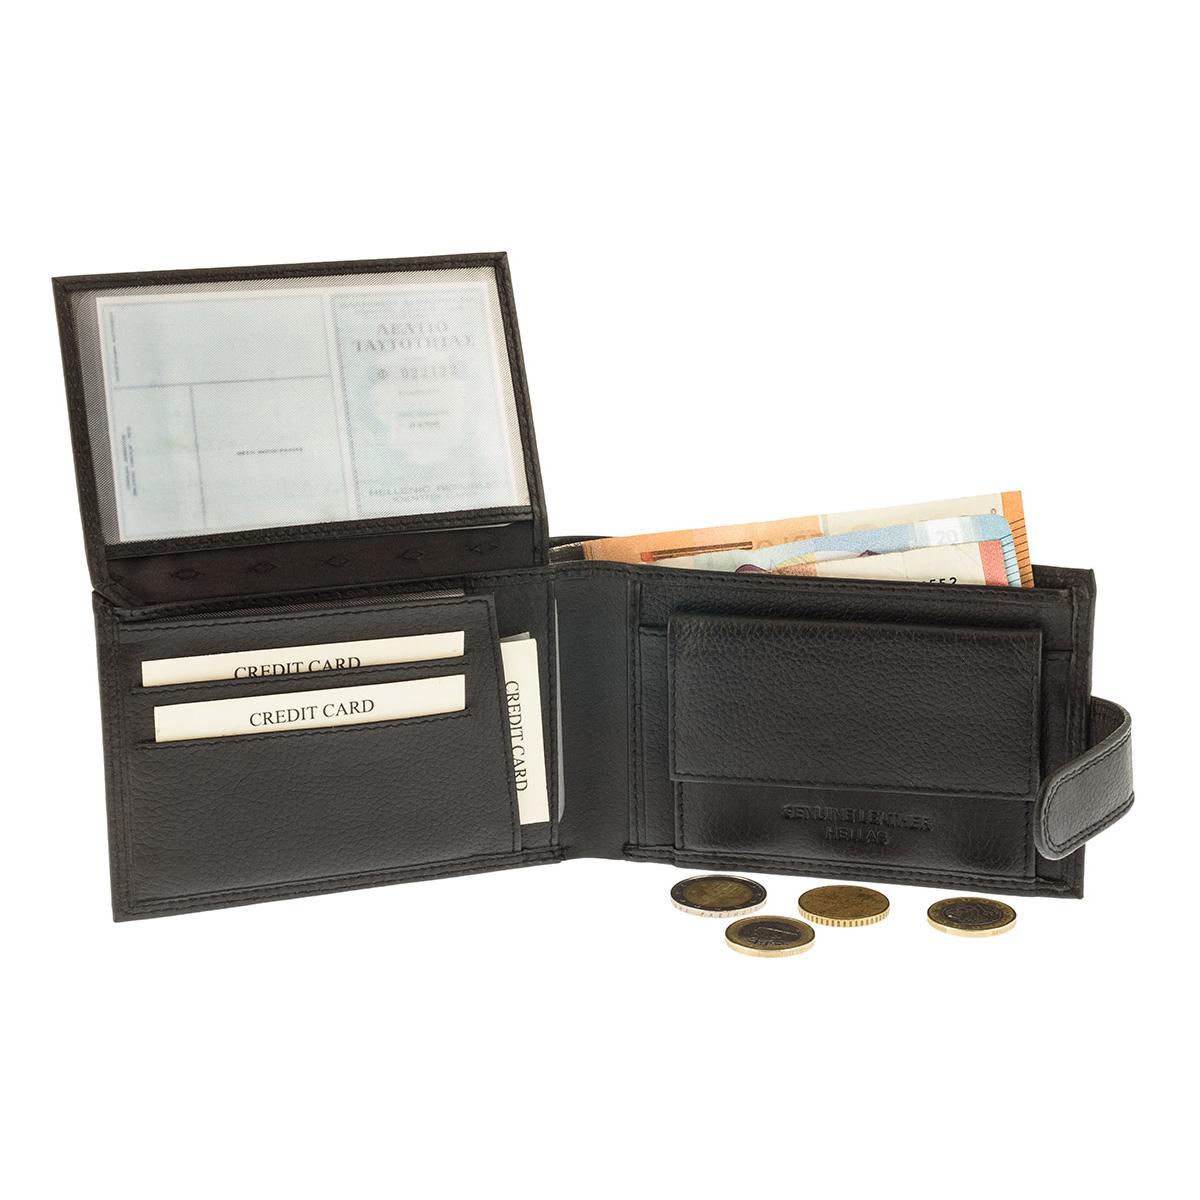 Kappa 960 Μαύρο Πορτοφόλι Ανδρικό - Με Κούμπωμα